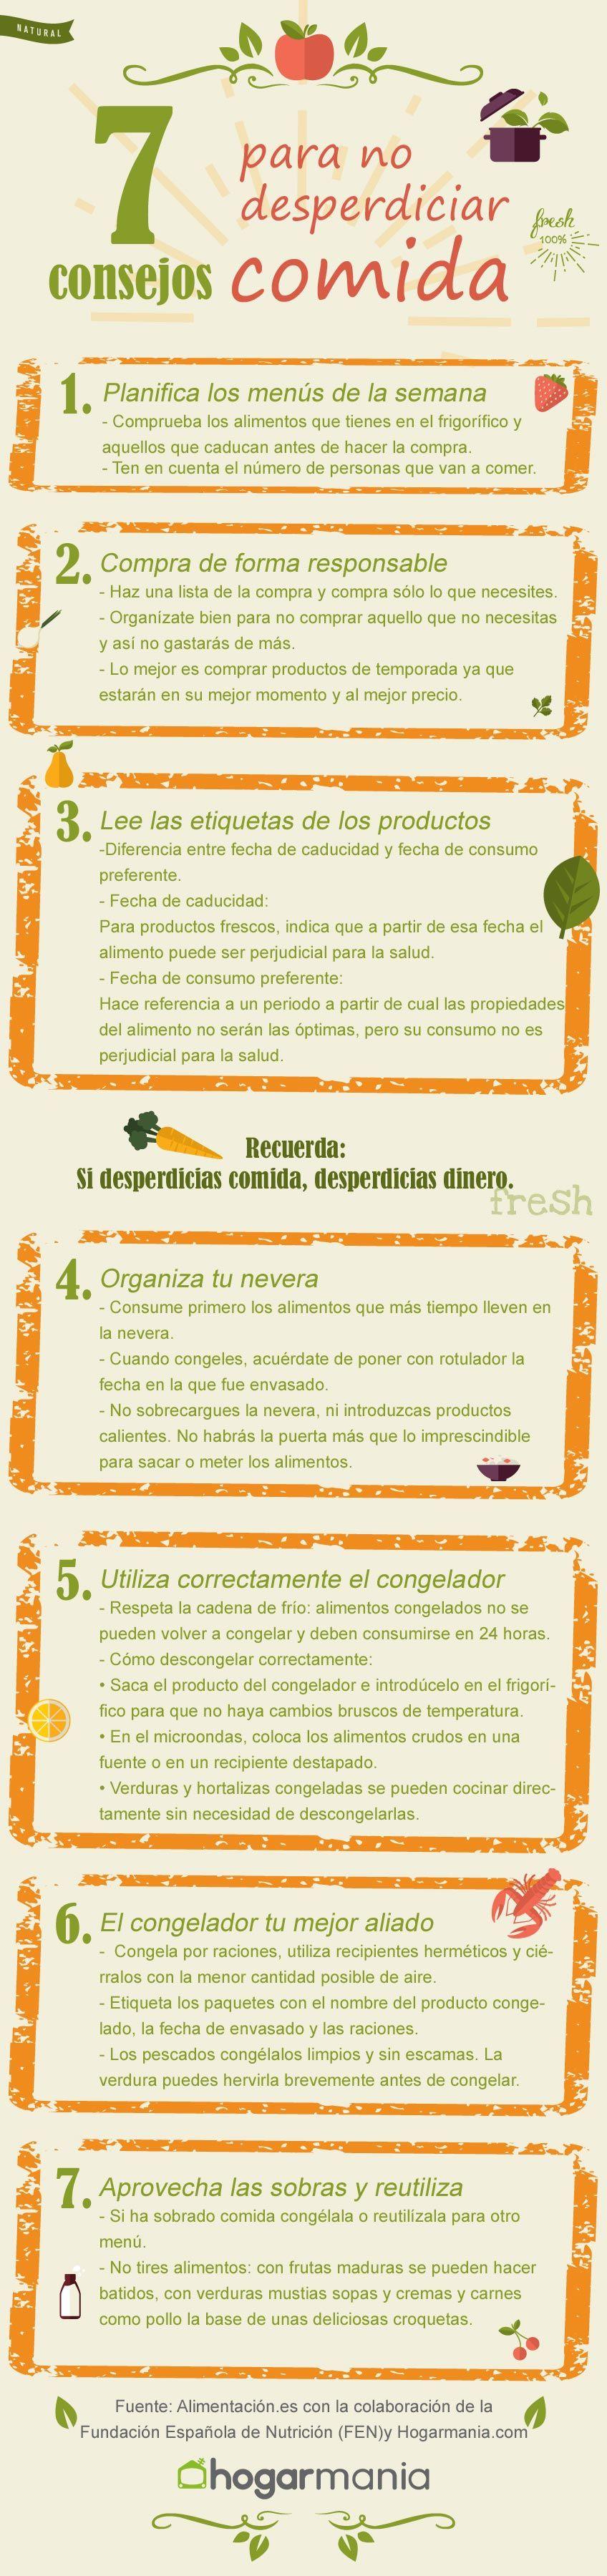 Infografía: 7 consejos para no desperdiciar comida